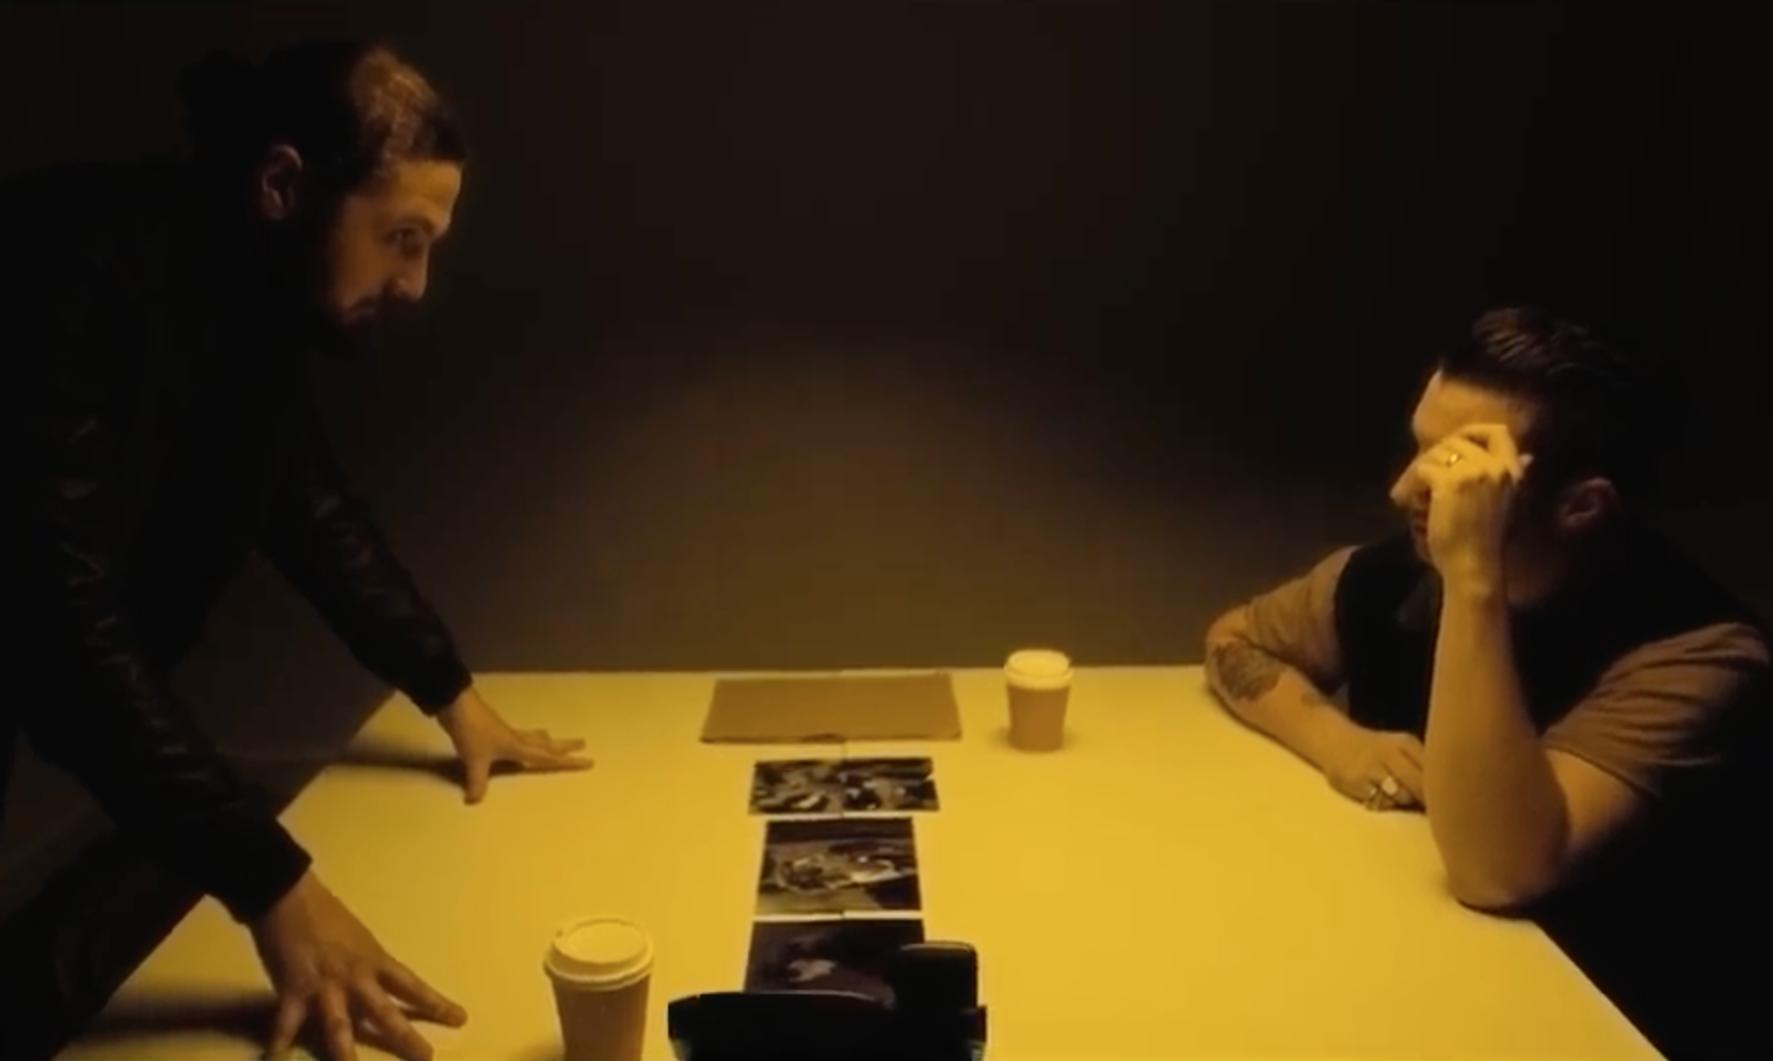 Matt Helders and Joe Carnall's Good Cop Bad Cop share murder mystery 'Silk & Leather' video